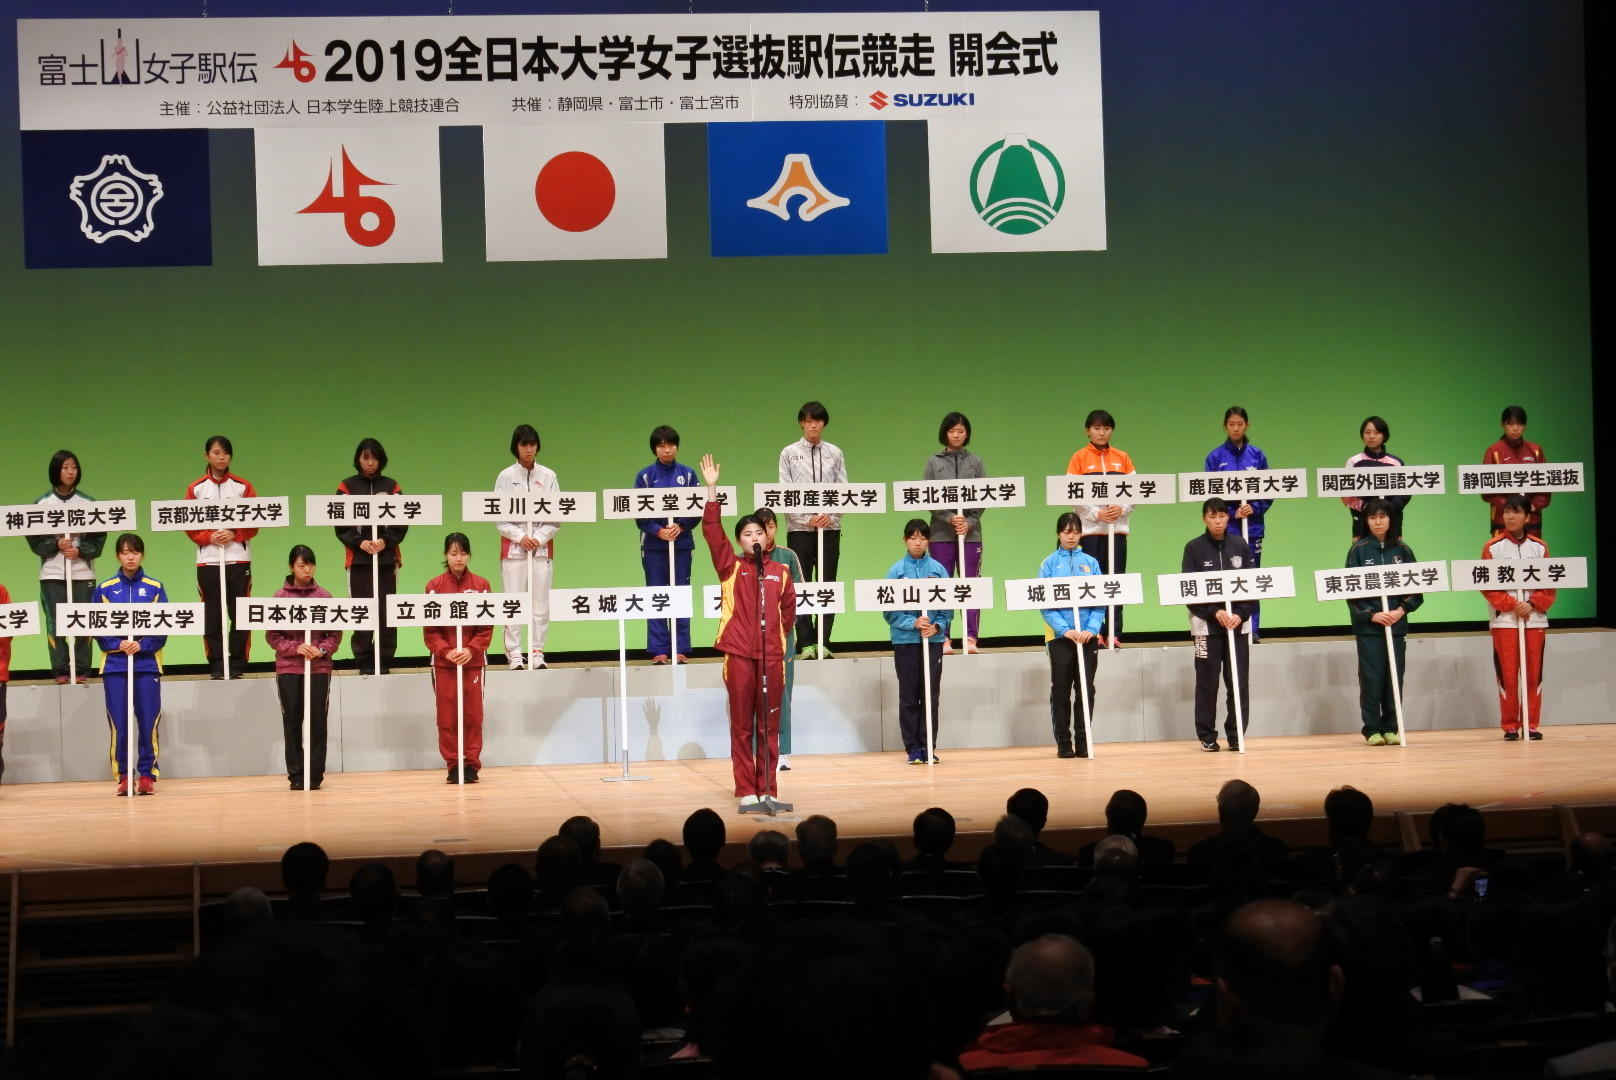 選手宣誓する塩崎主将。後列右端は静岡県学生選抜の黒川主将